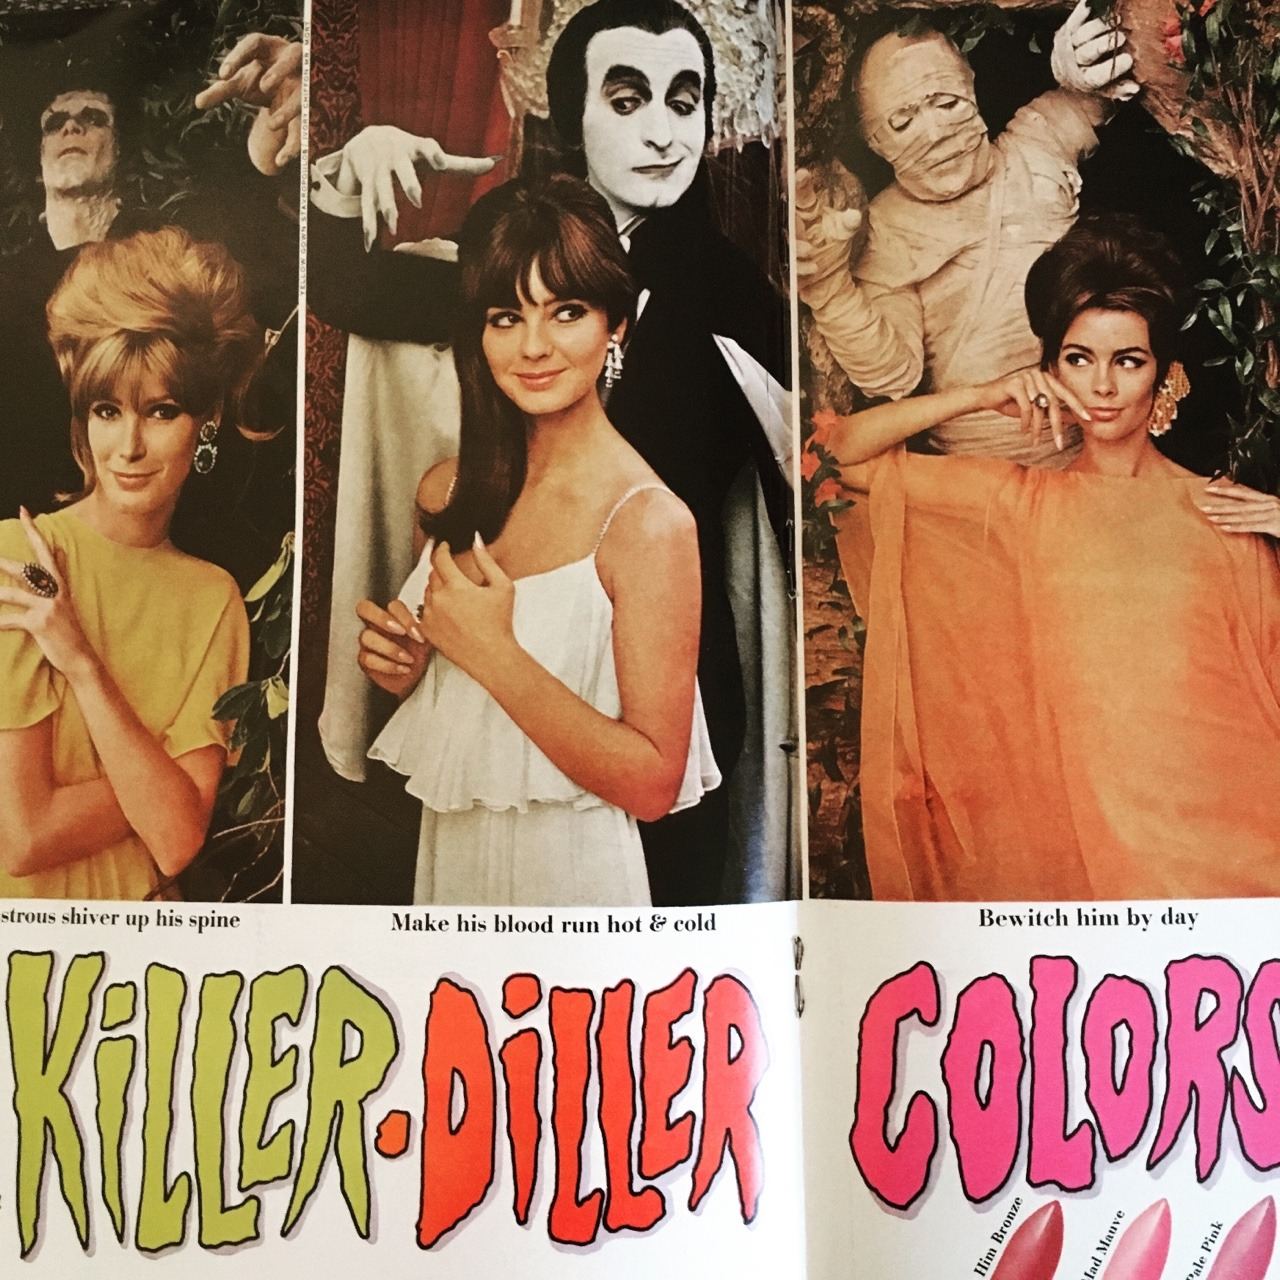 Killer-Diller Colors by Cutex. Co-Ed Magazine. April 1966.